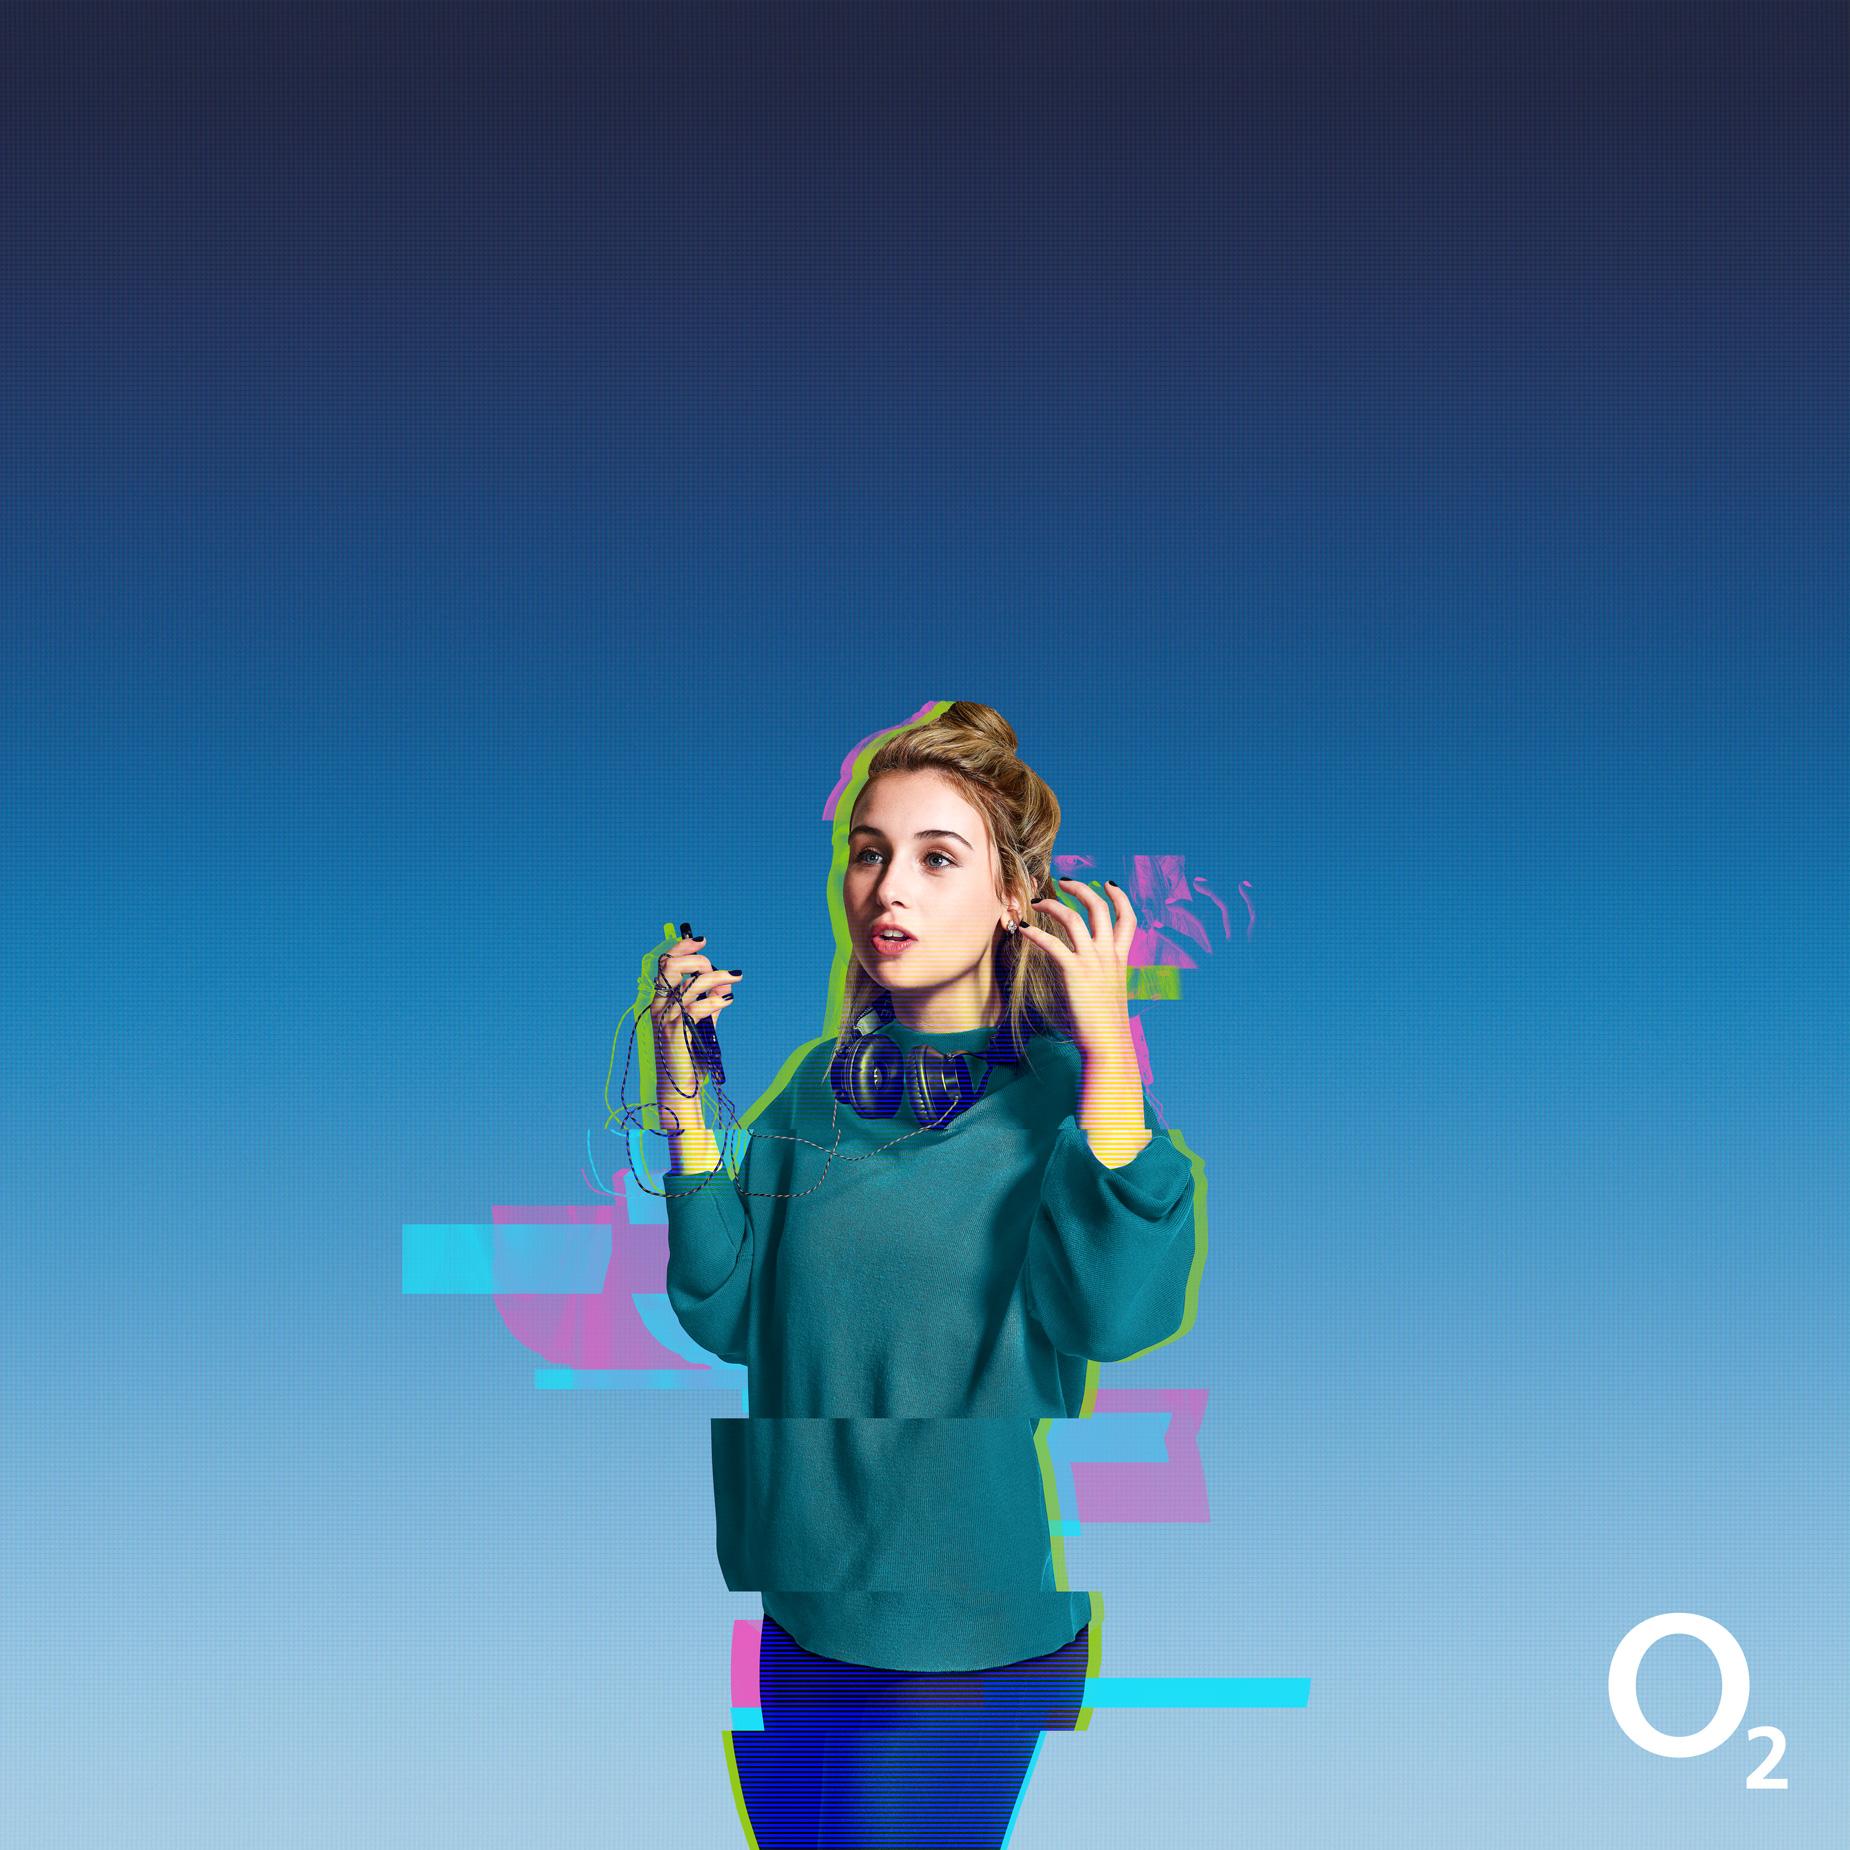 O2-Go-Think-Big-Chloe-Hine-3-Small-RGB